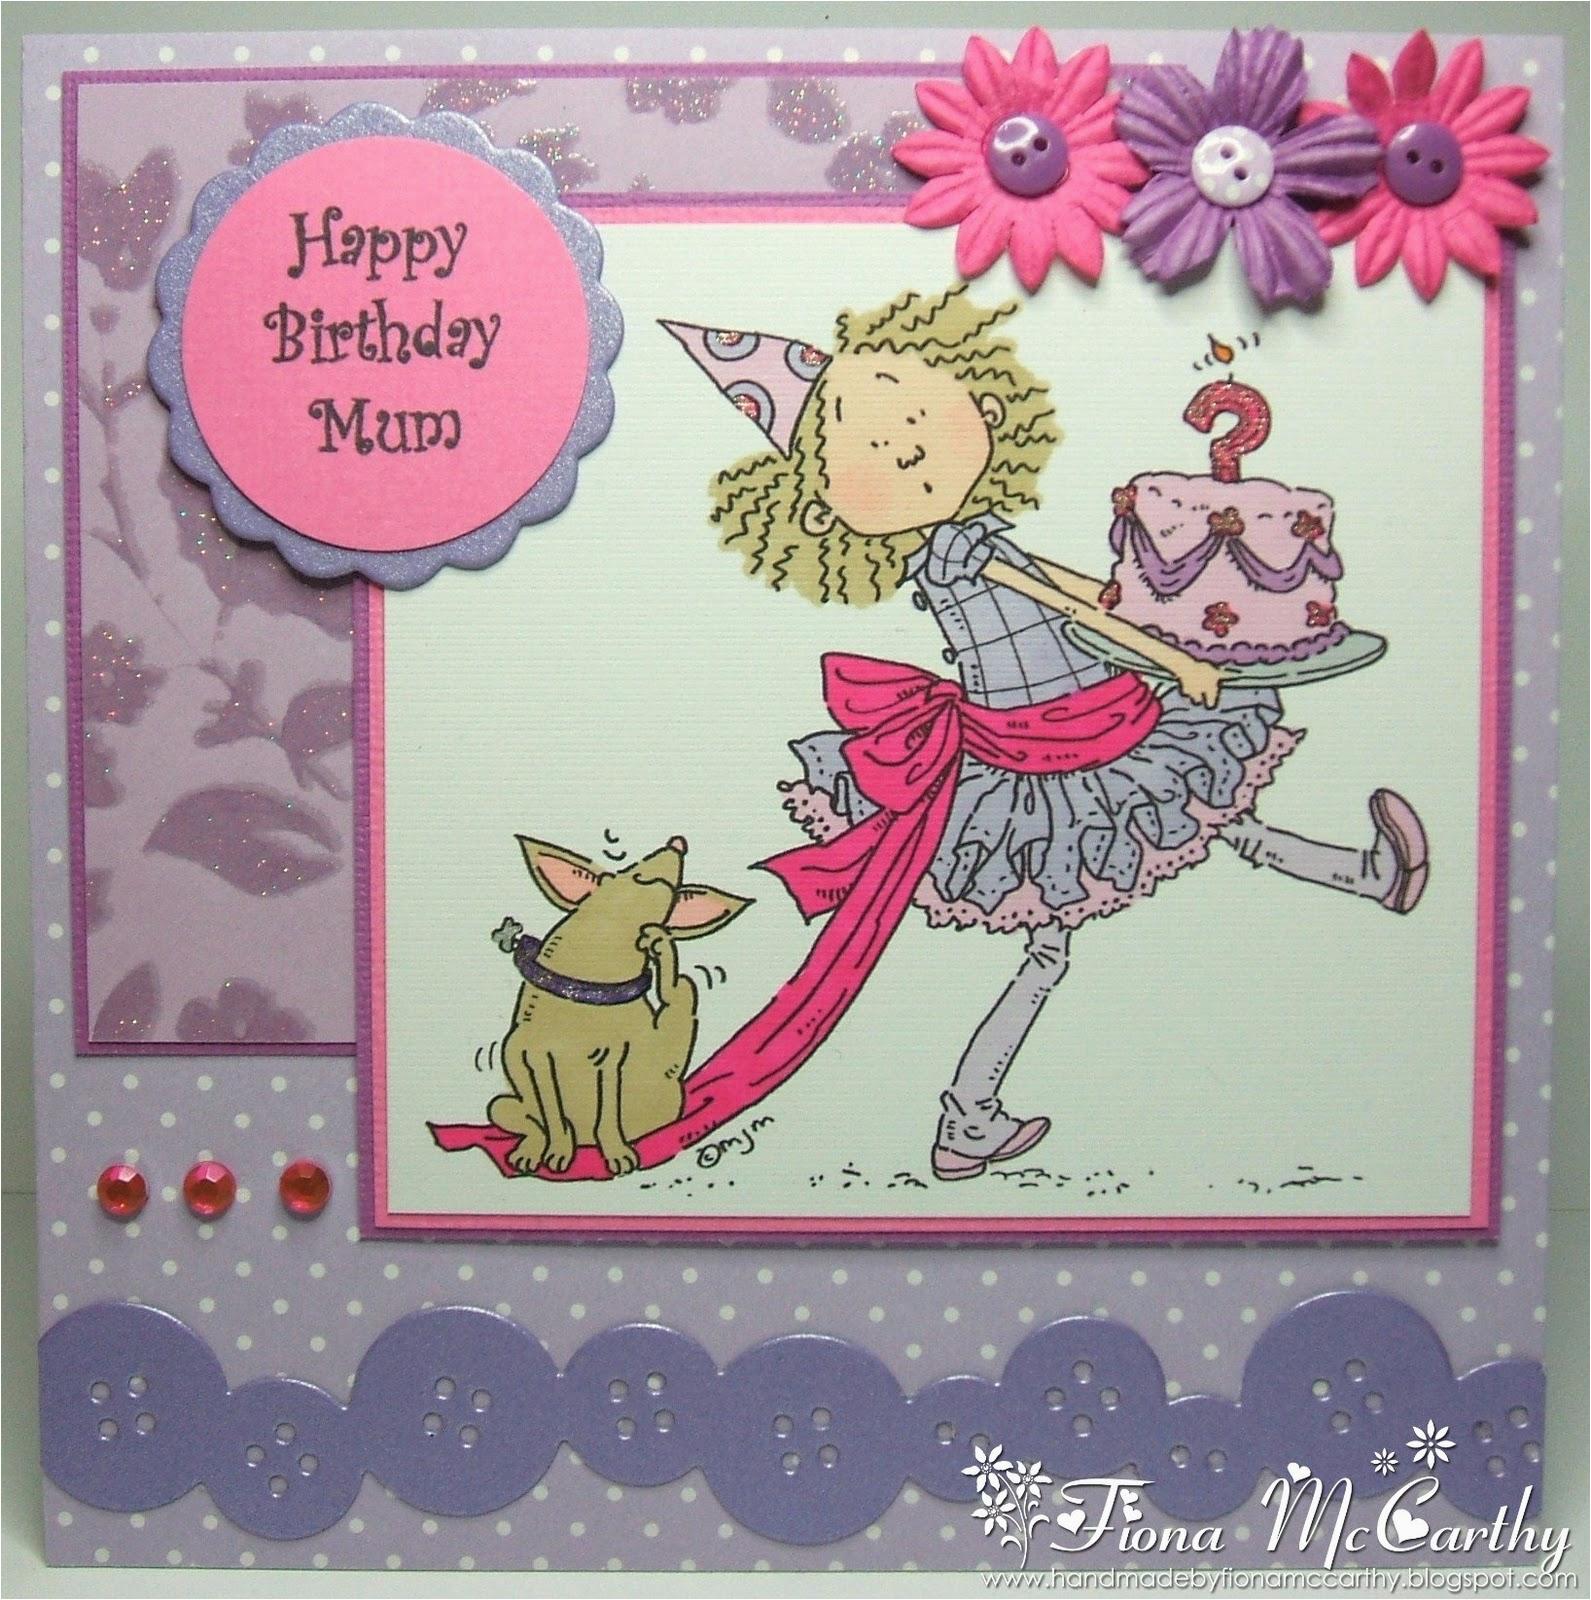 Homemade Birthday Card Ideas For Mom 28